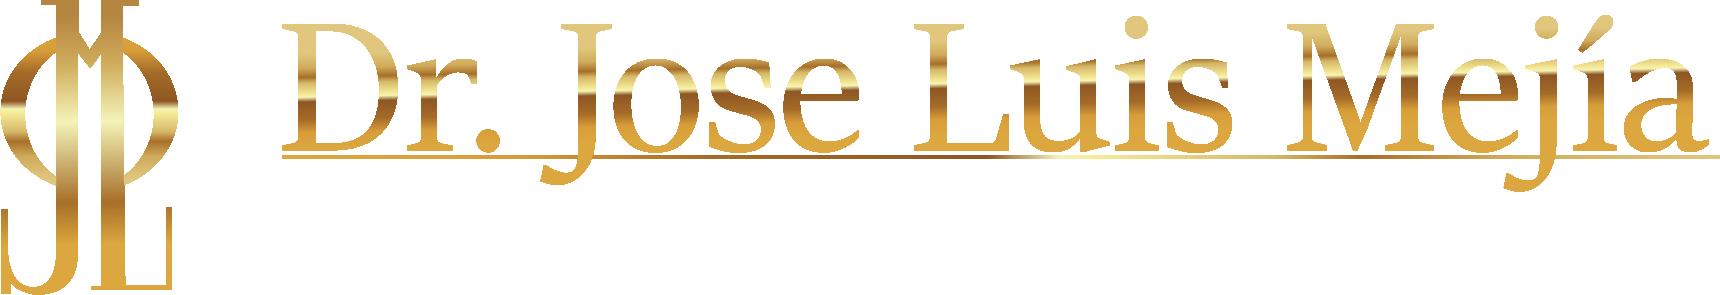 Dr. Jose Luis Mejía